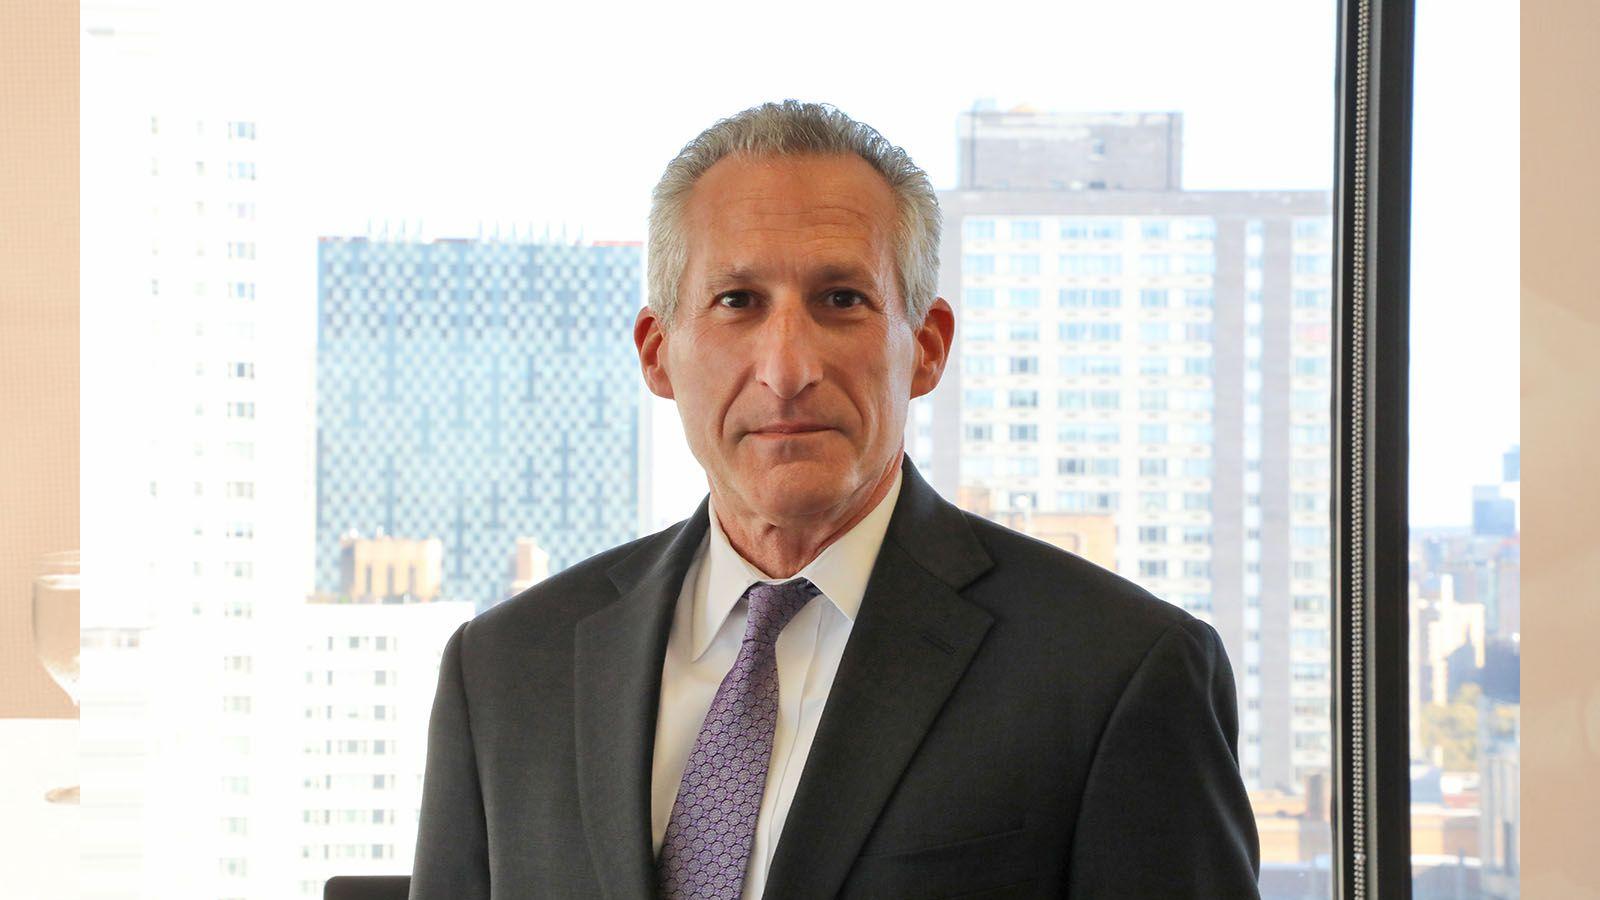 Lon Kaufman